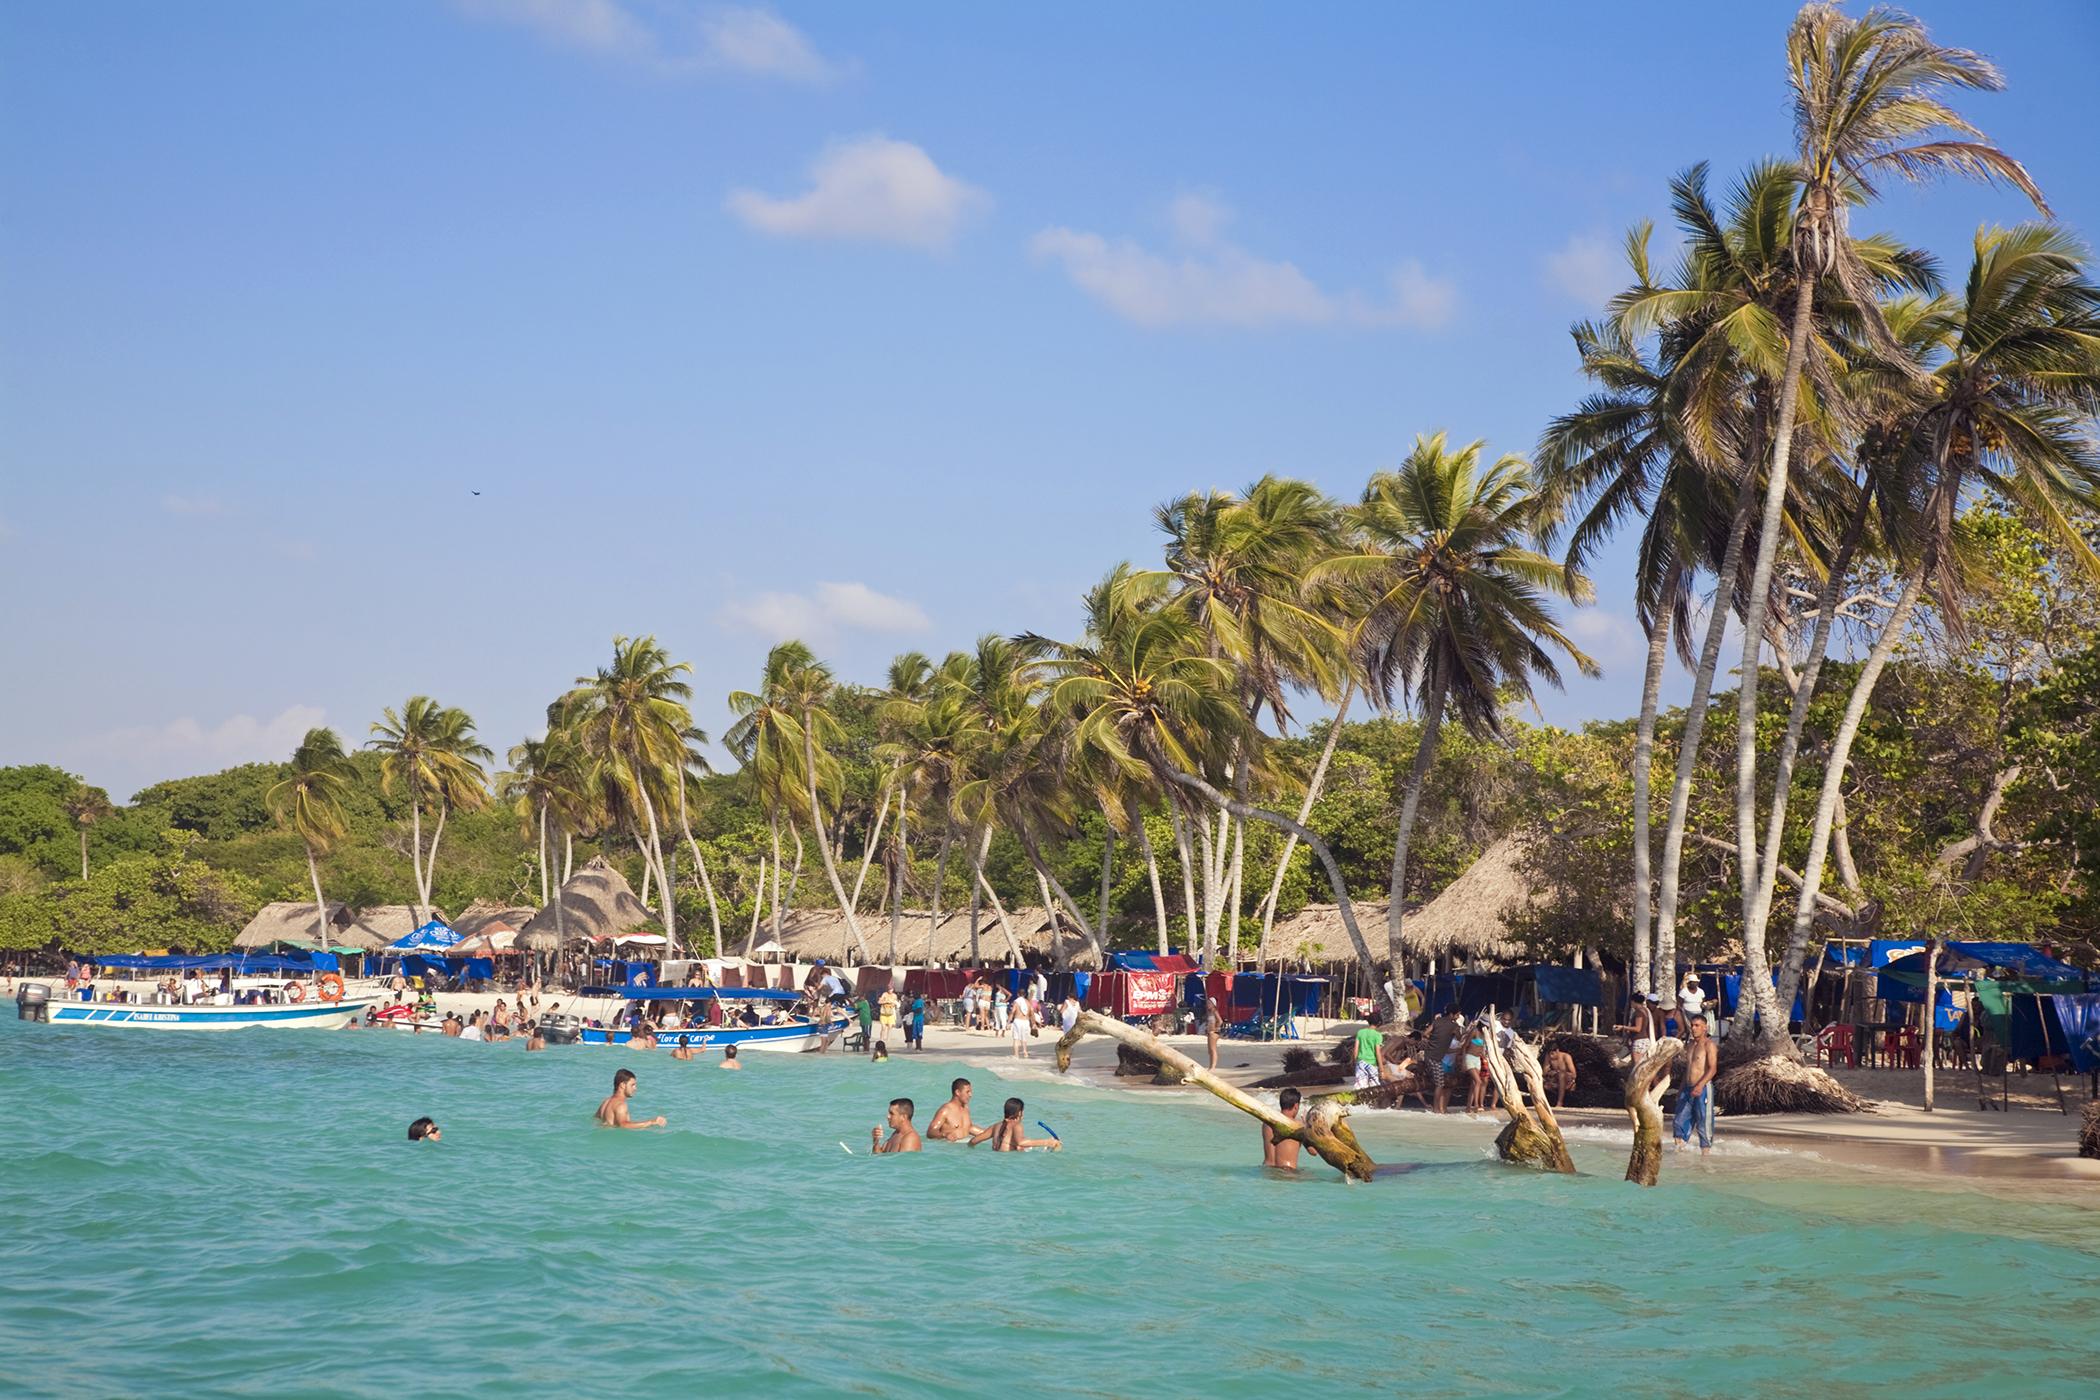 170316-travel-best-beaches-playa-blanca-colombia